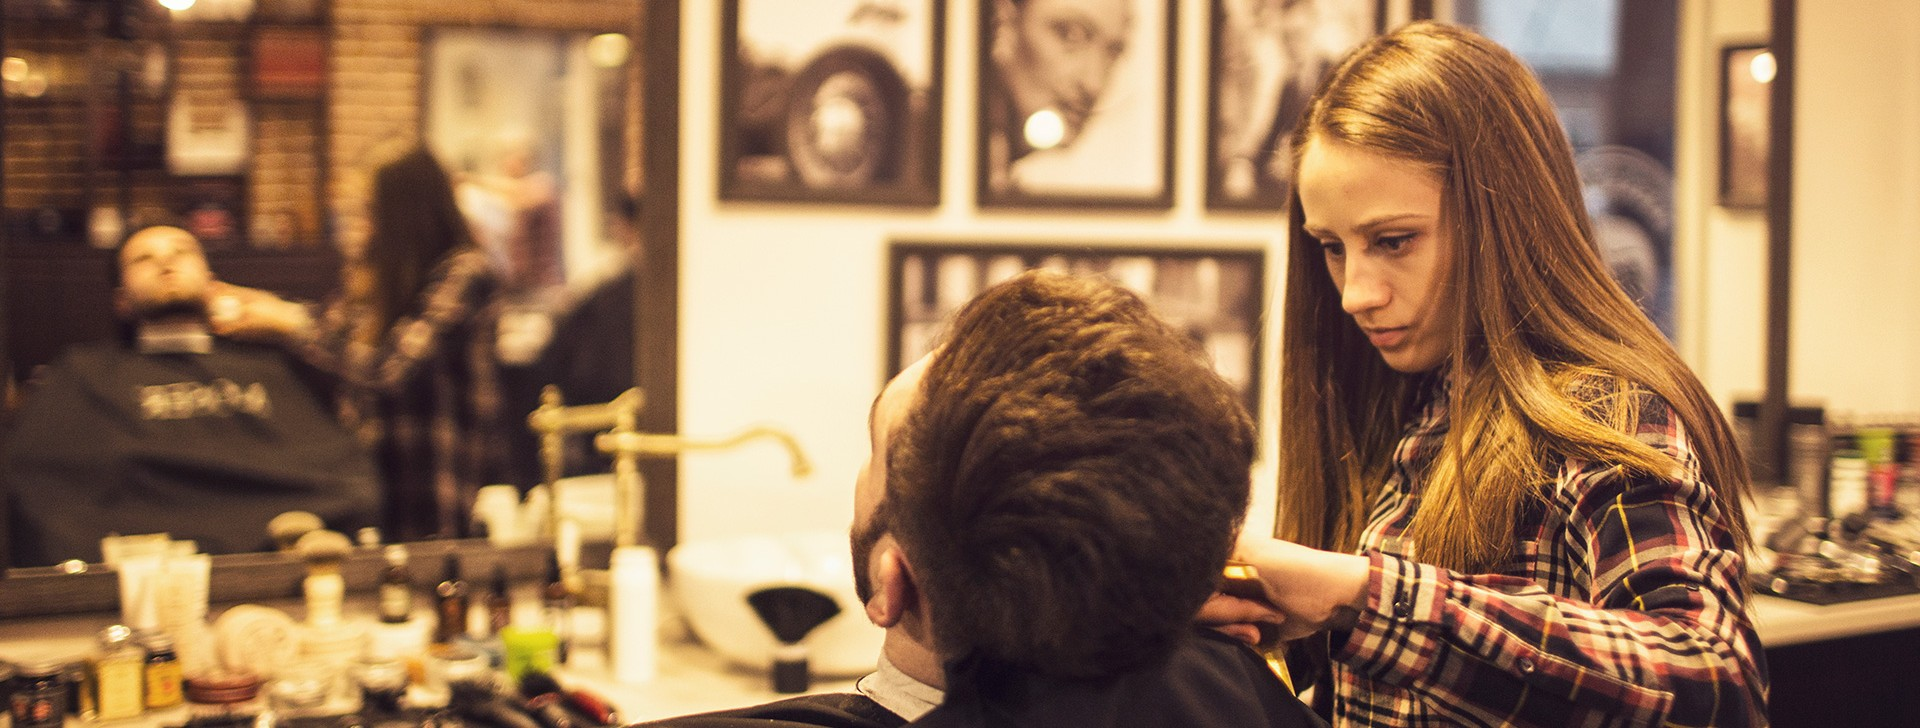 acasa-the-barber-barbershop-bucuresti-slider-02